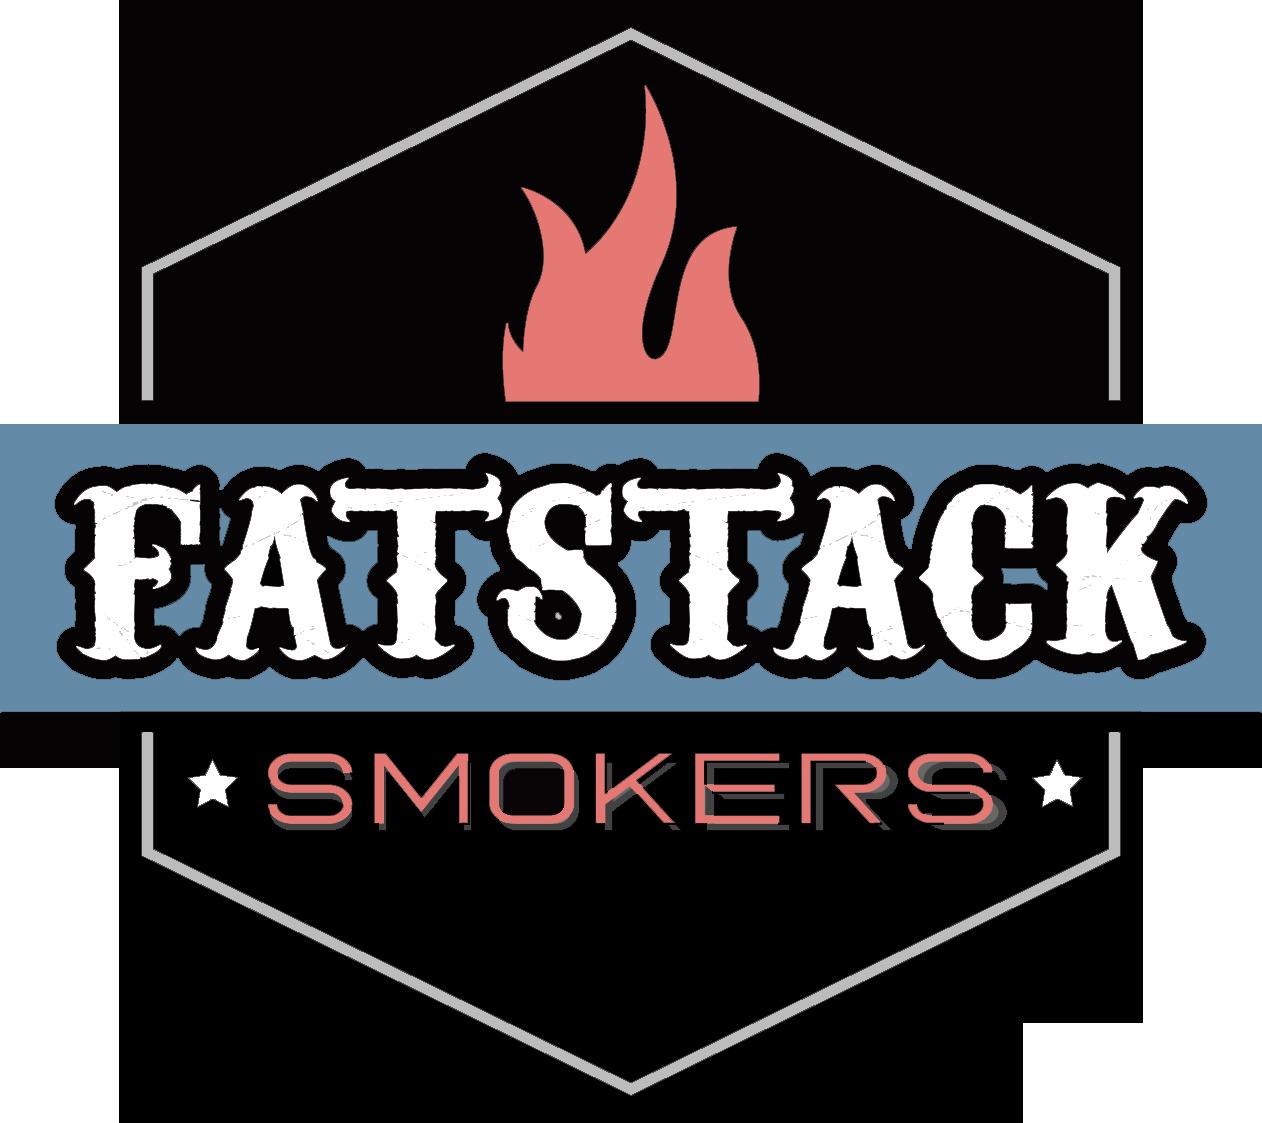 FatStack Smokers